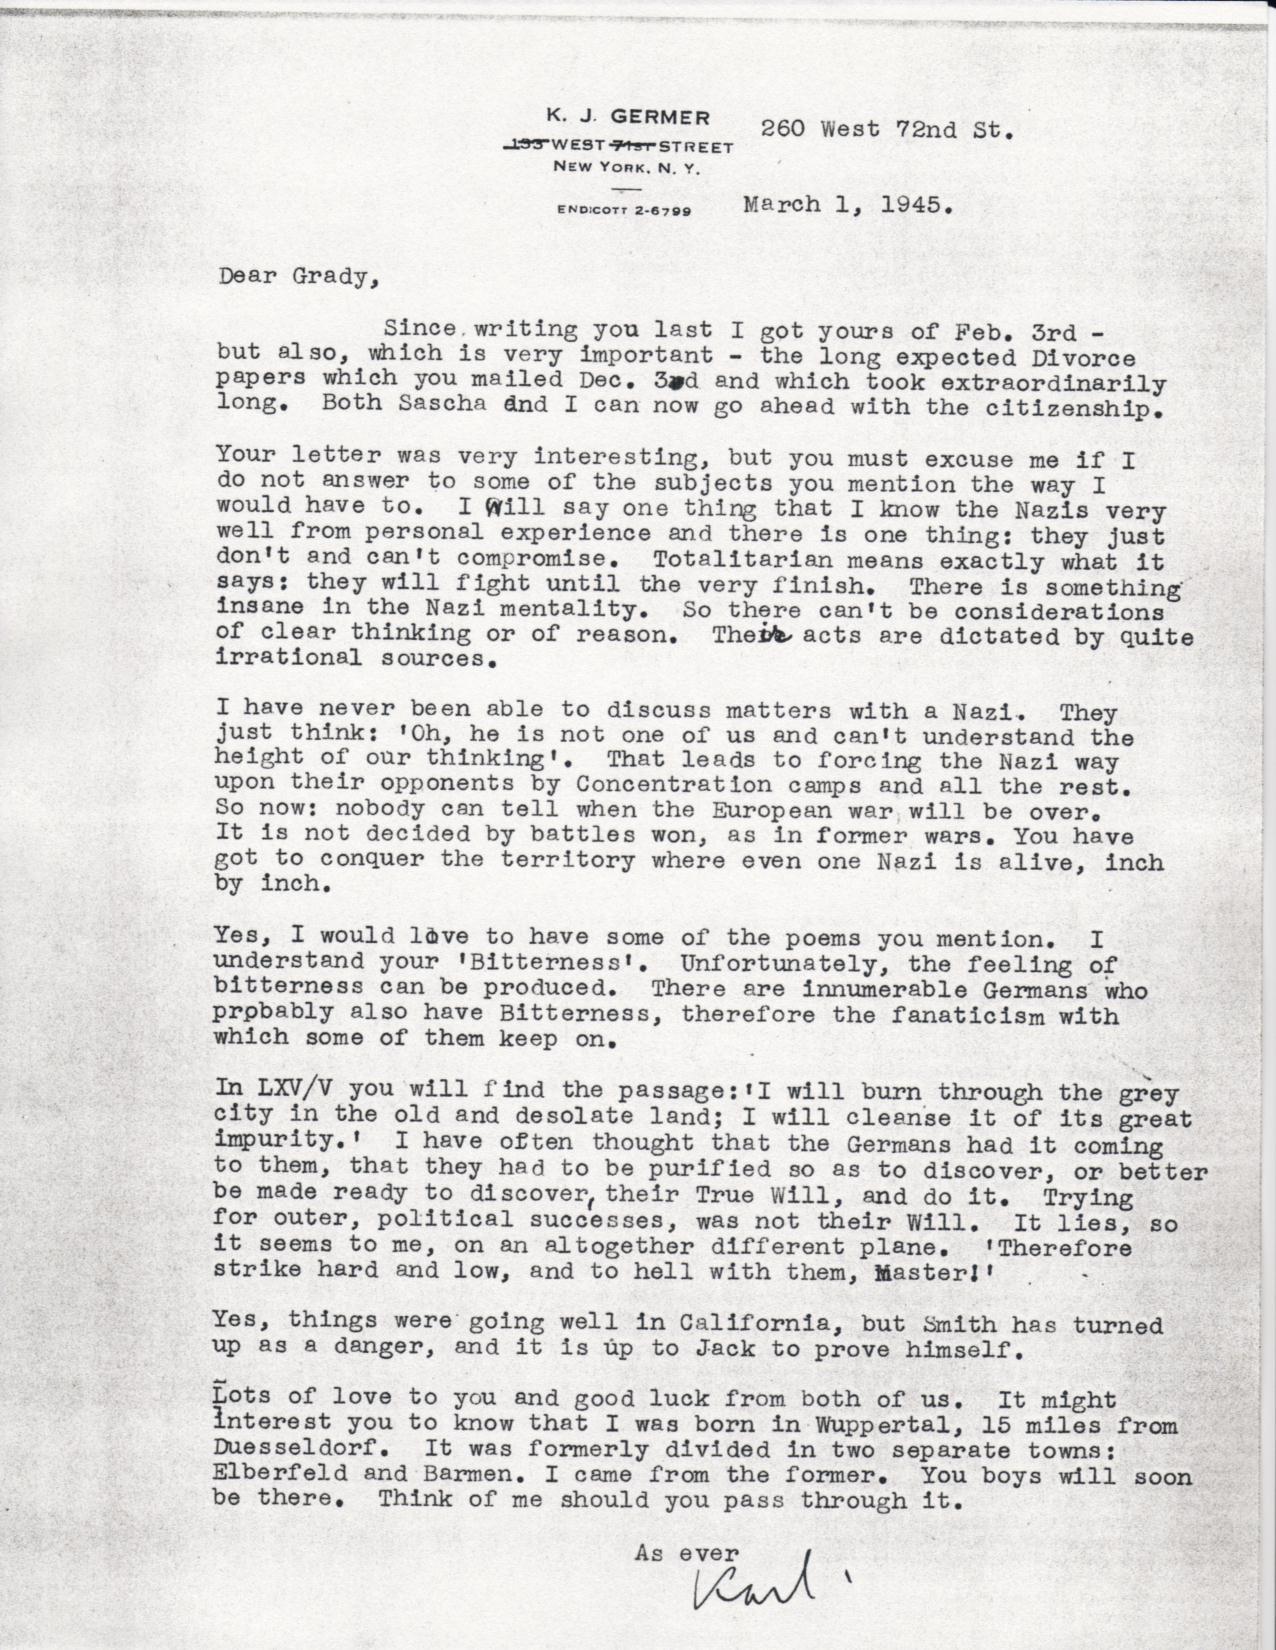 (03/01/1945) Karl Germer to Grady McMurtry